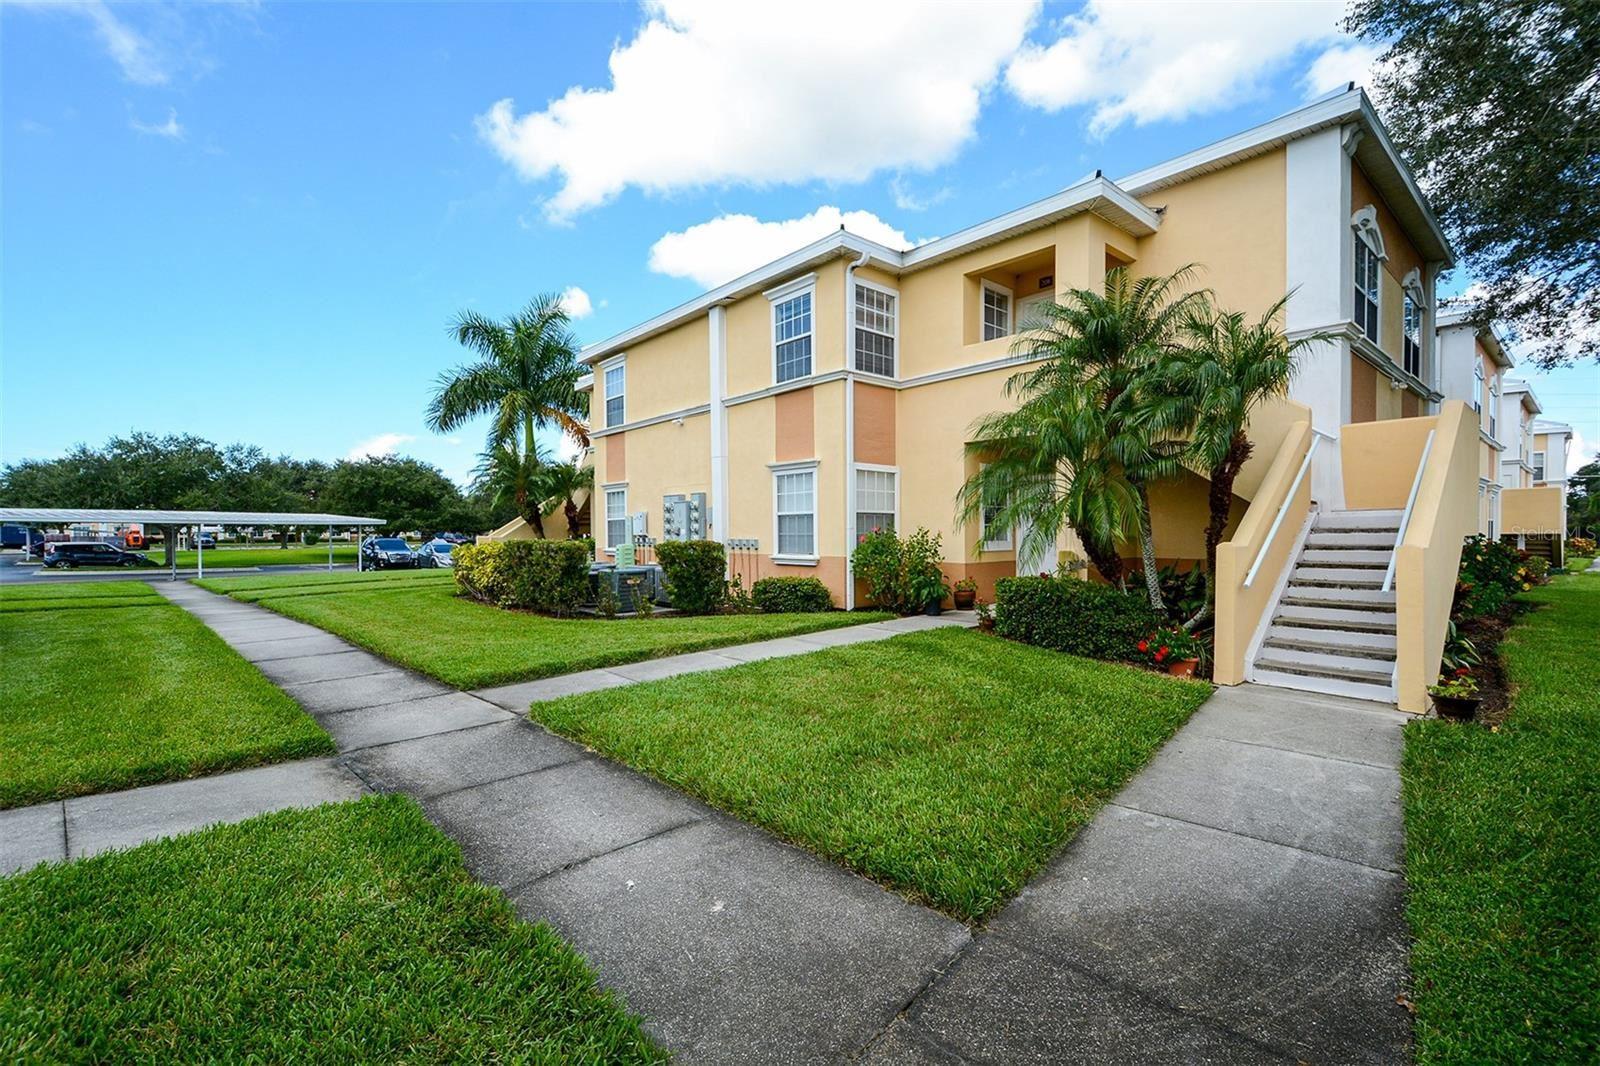 1050 VILLAGIO CIRCLE #208, Sarasota, FL 34237 - #: A4512720